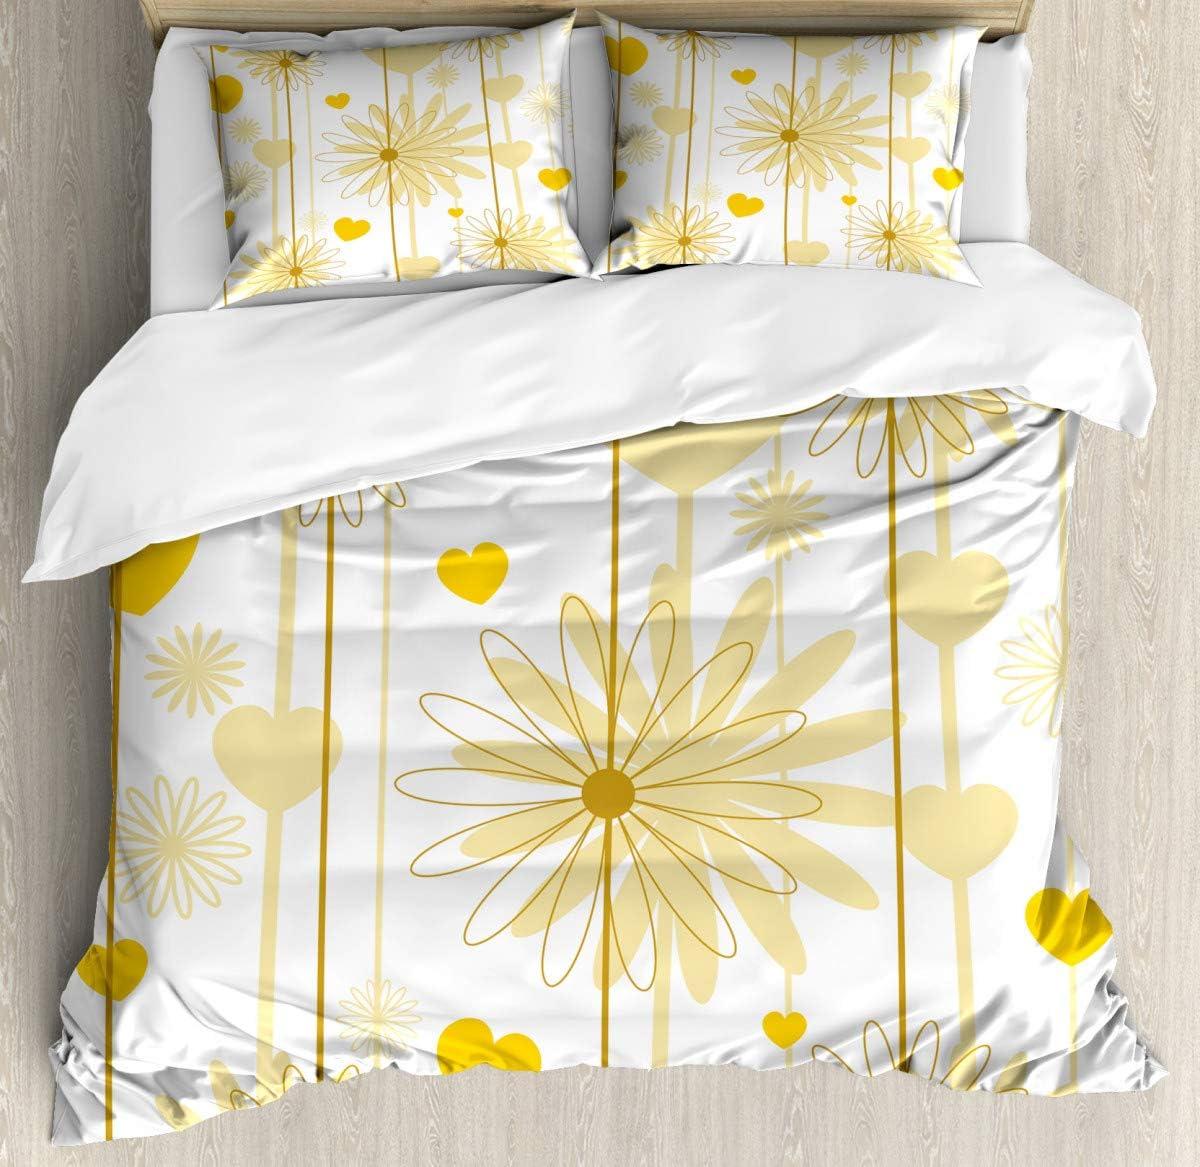 "Duvet Cover Bedding Duvet Cover SetValentines Floral Design Duvet Cover SetCustom 3 Piece Bedding Set with 2 Pillow Shams,70""x86""/19""x29""inch"